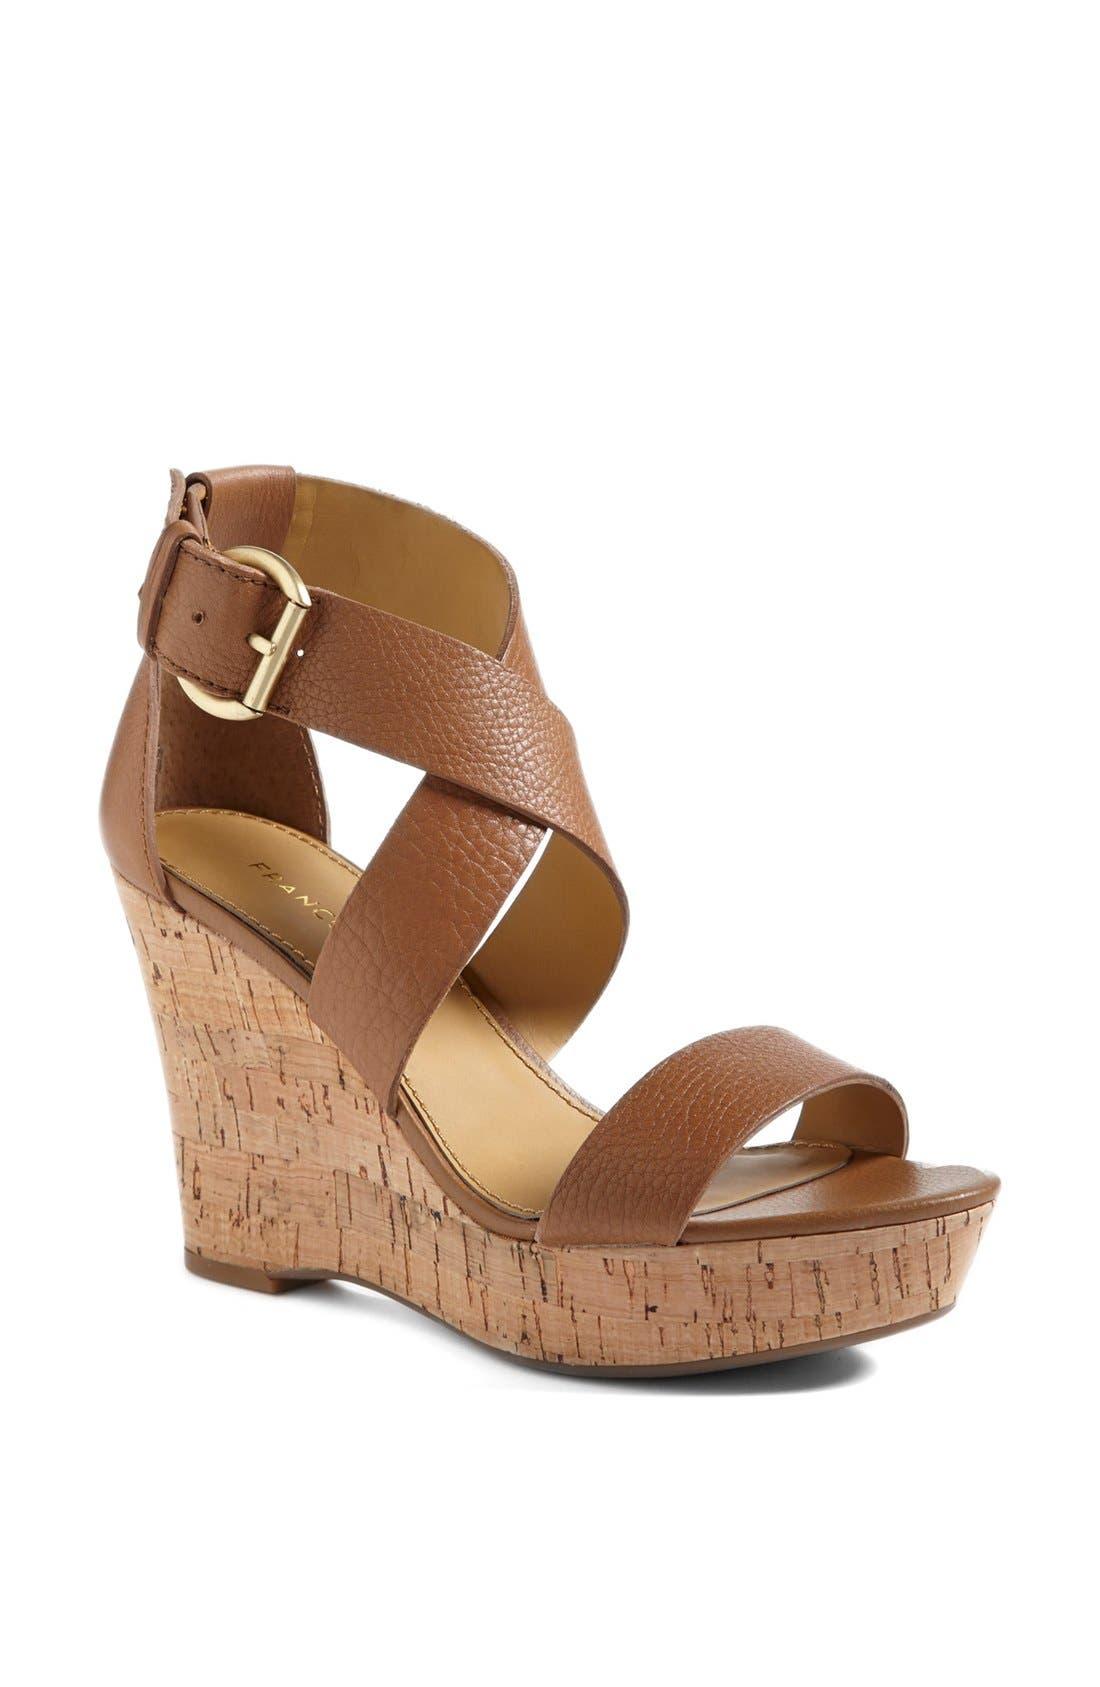 Main Image - Franco Sarto 'Sitar' Sandal